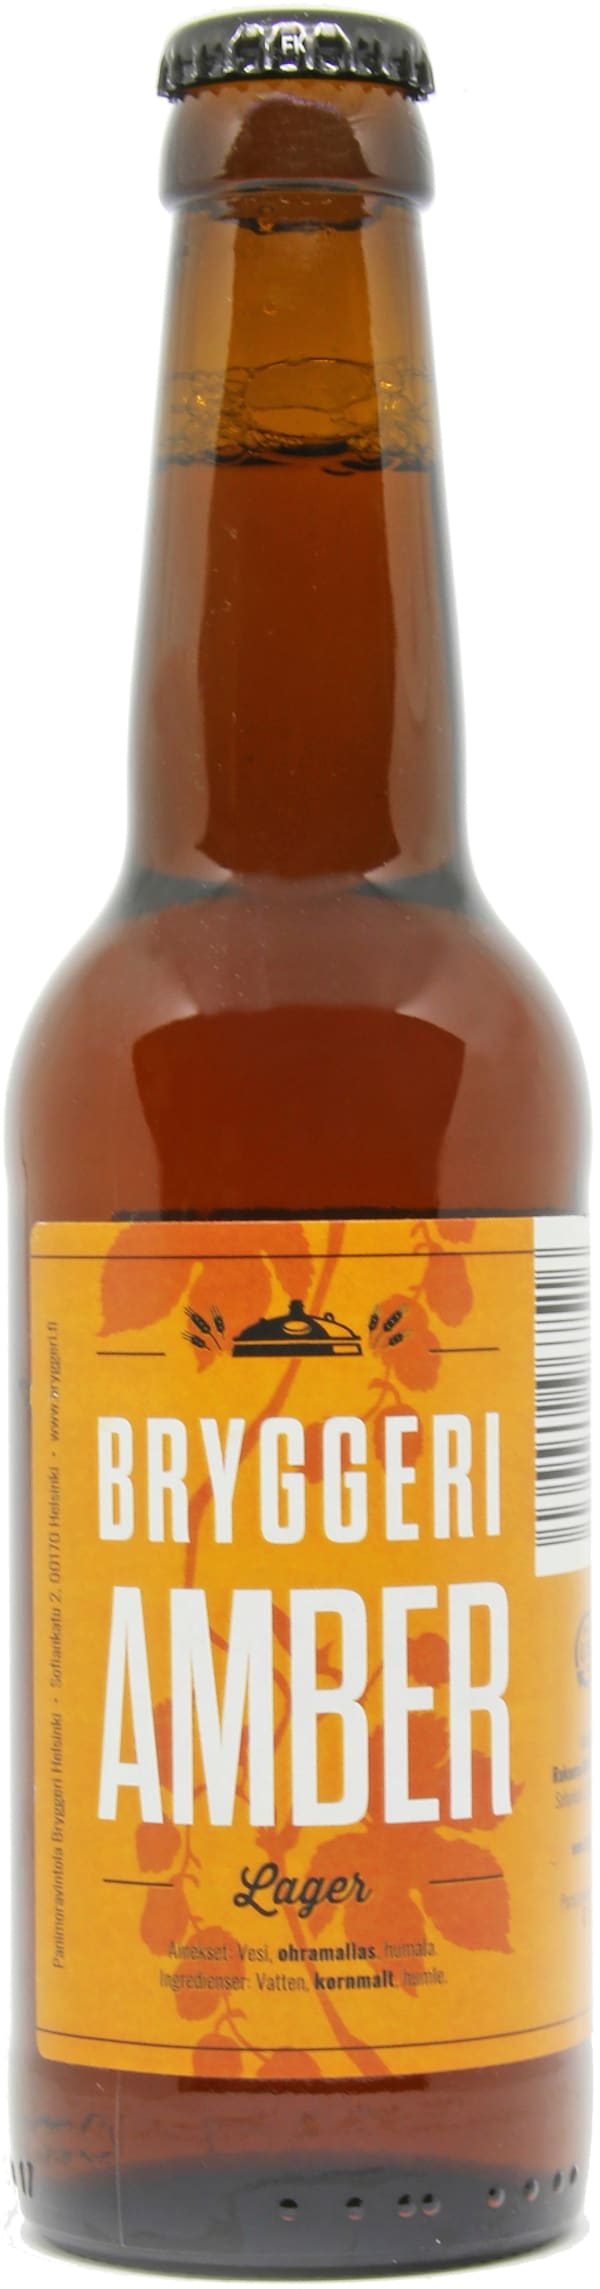 Bryggeri Amber Lager